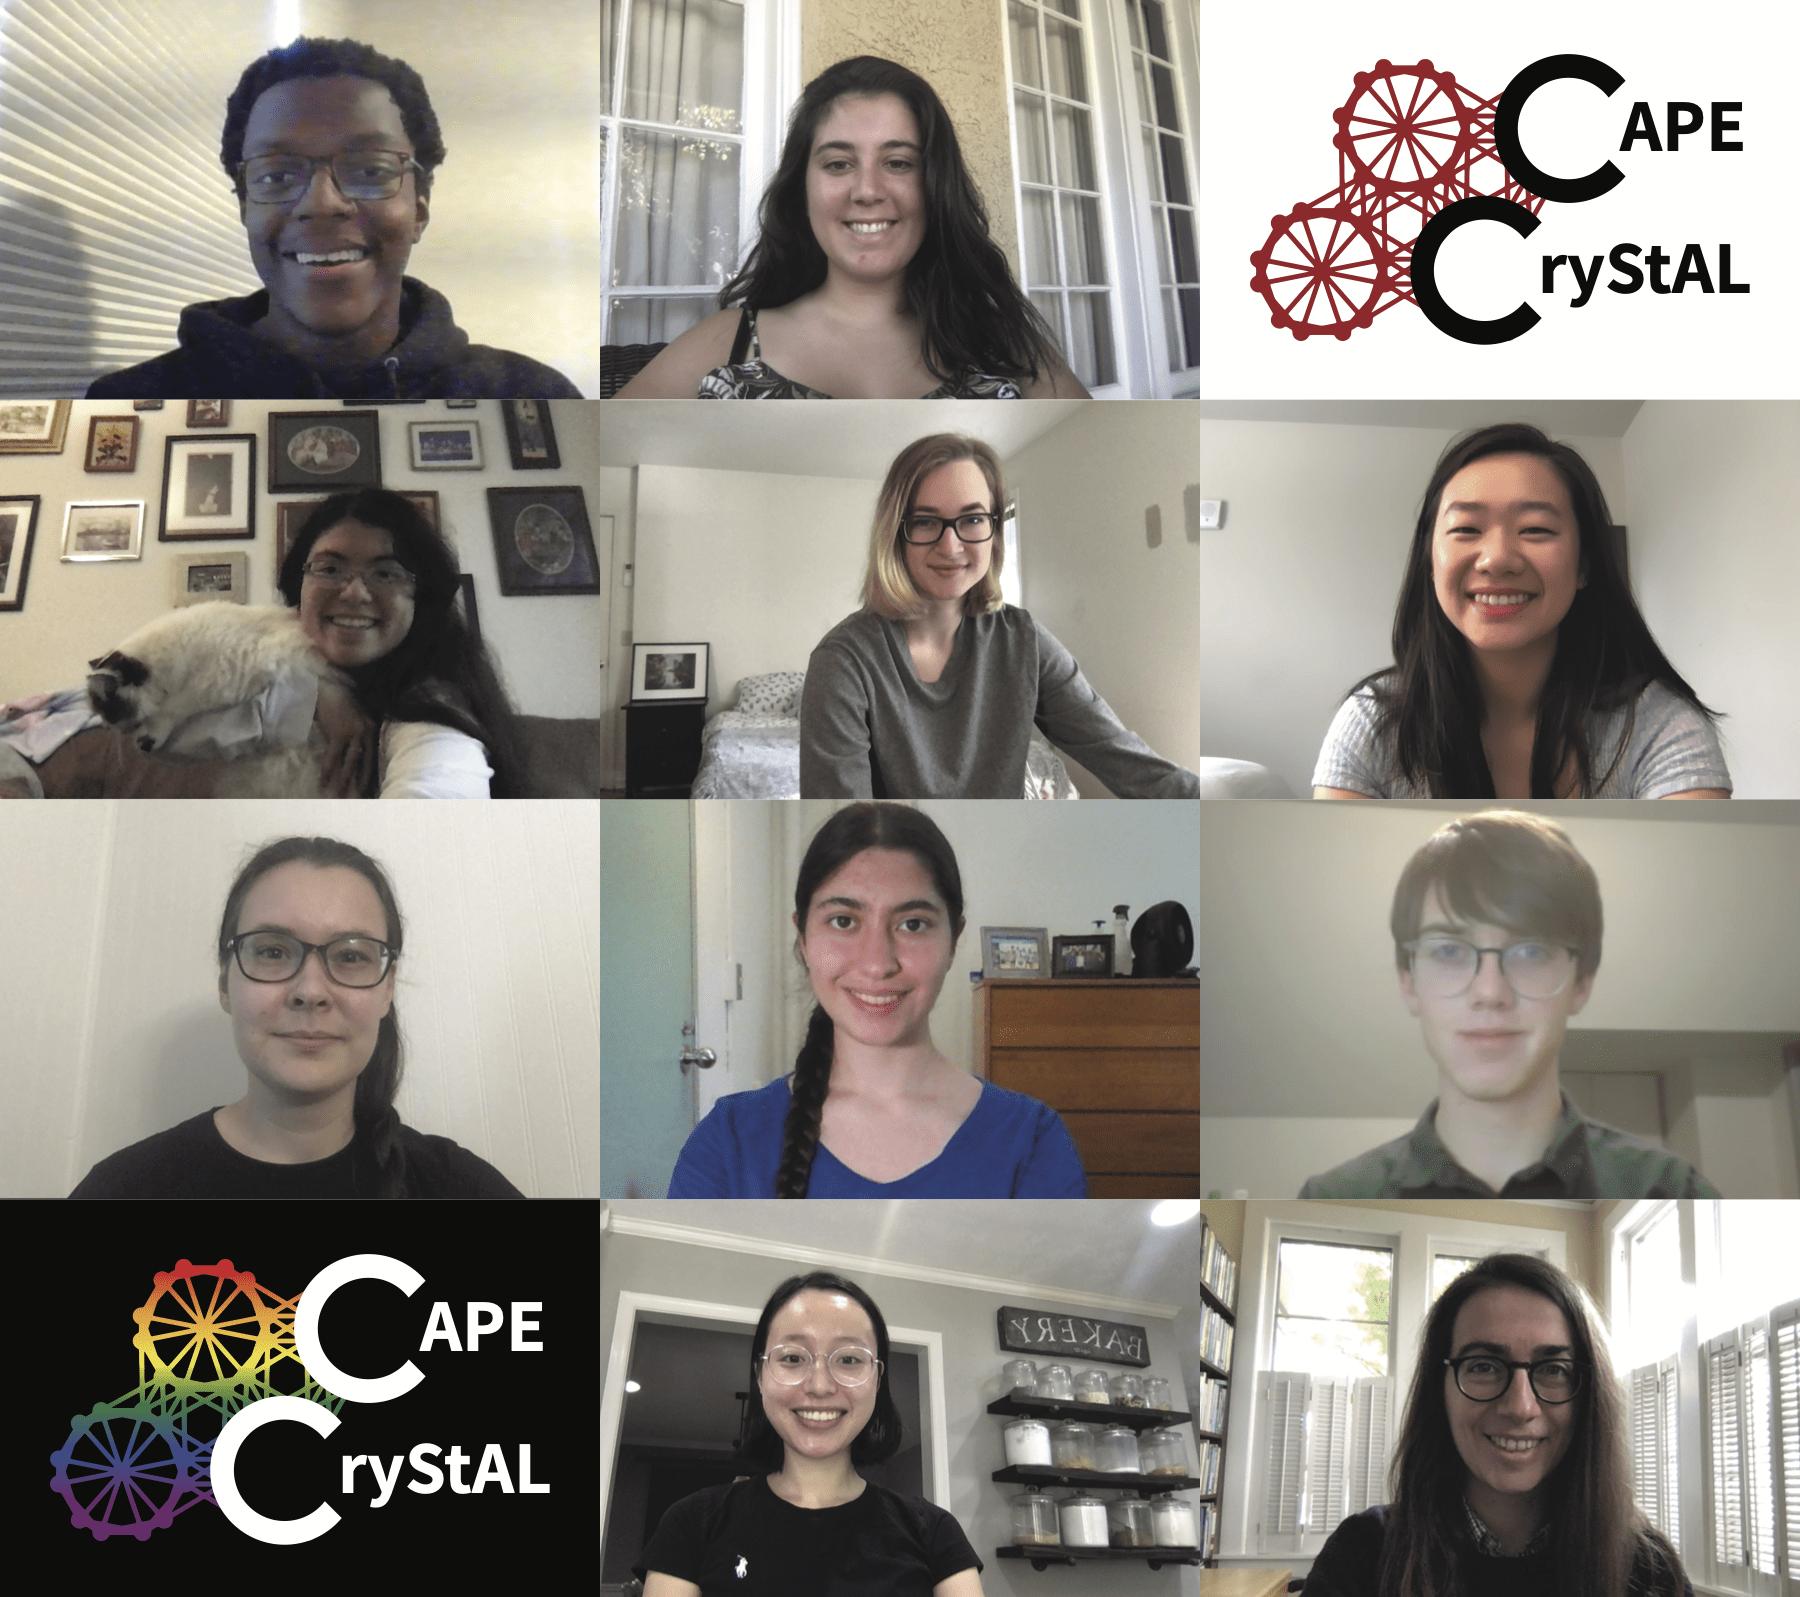 Cape Crystal